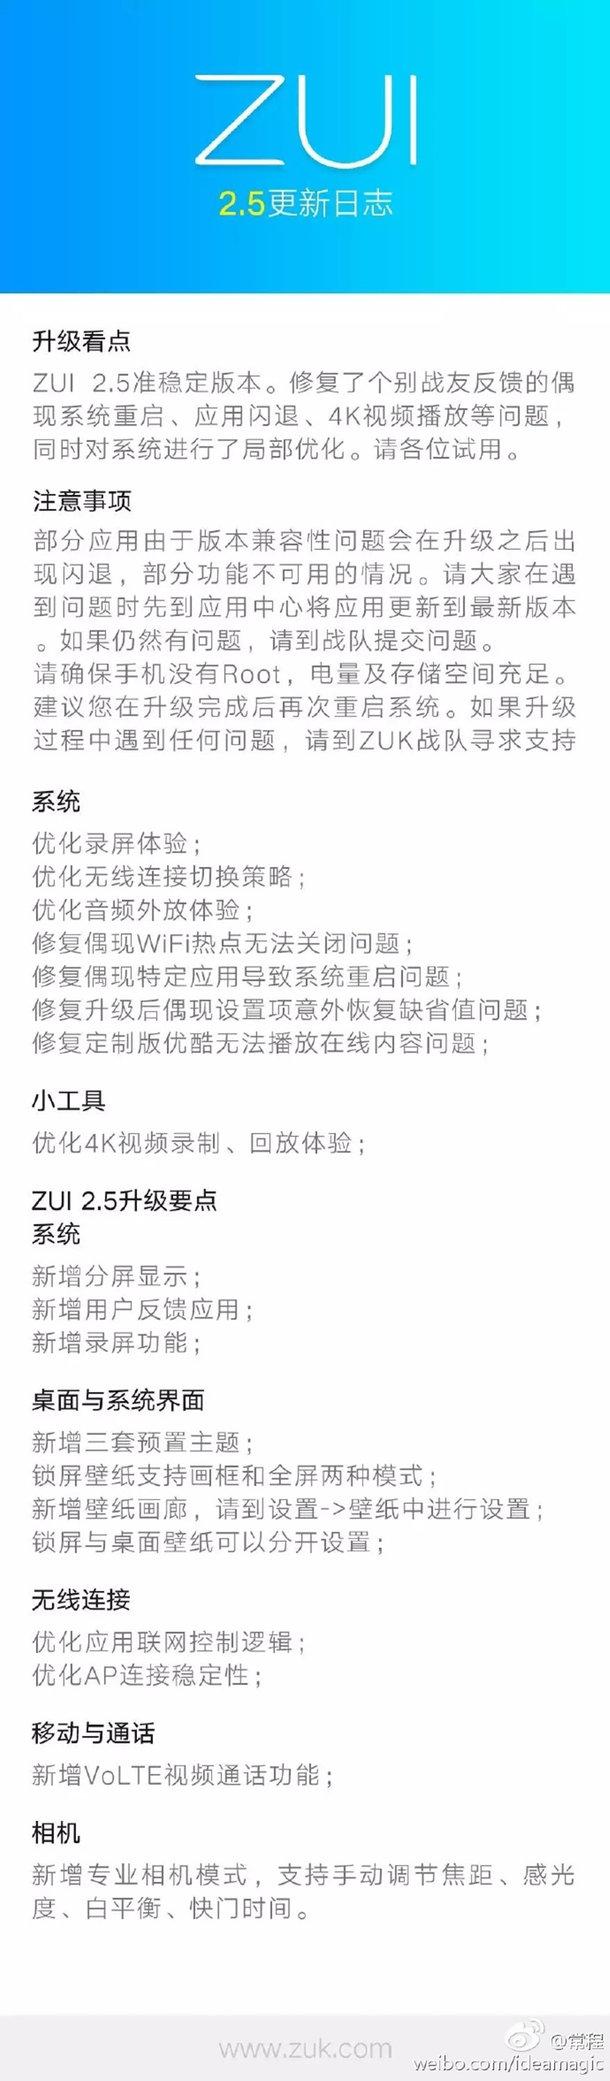 zui-2.5-change-log